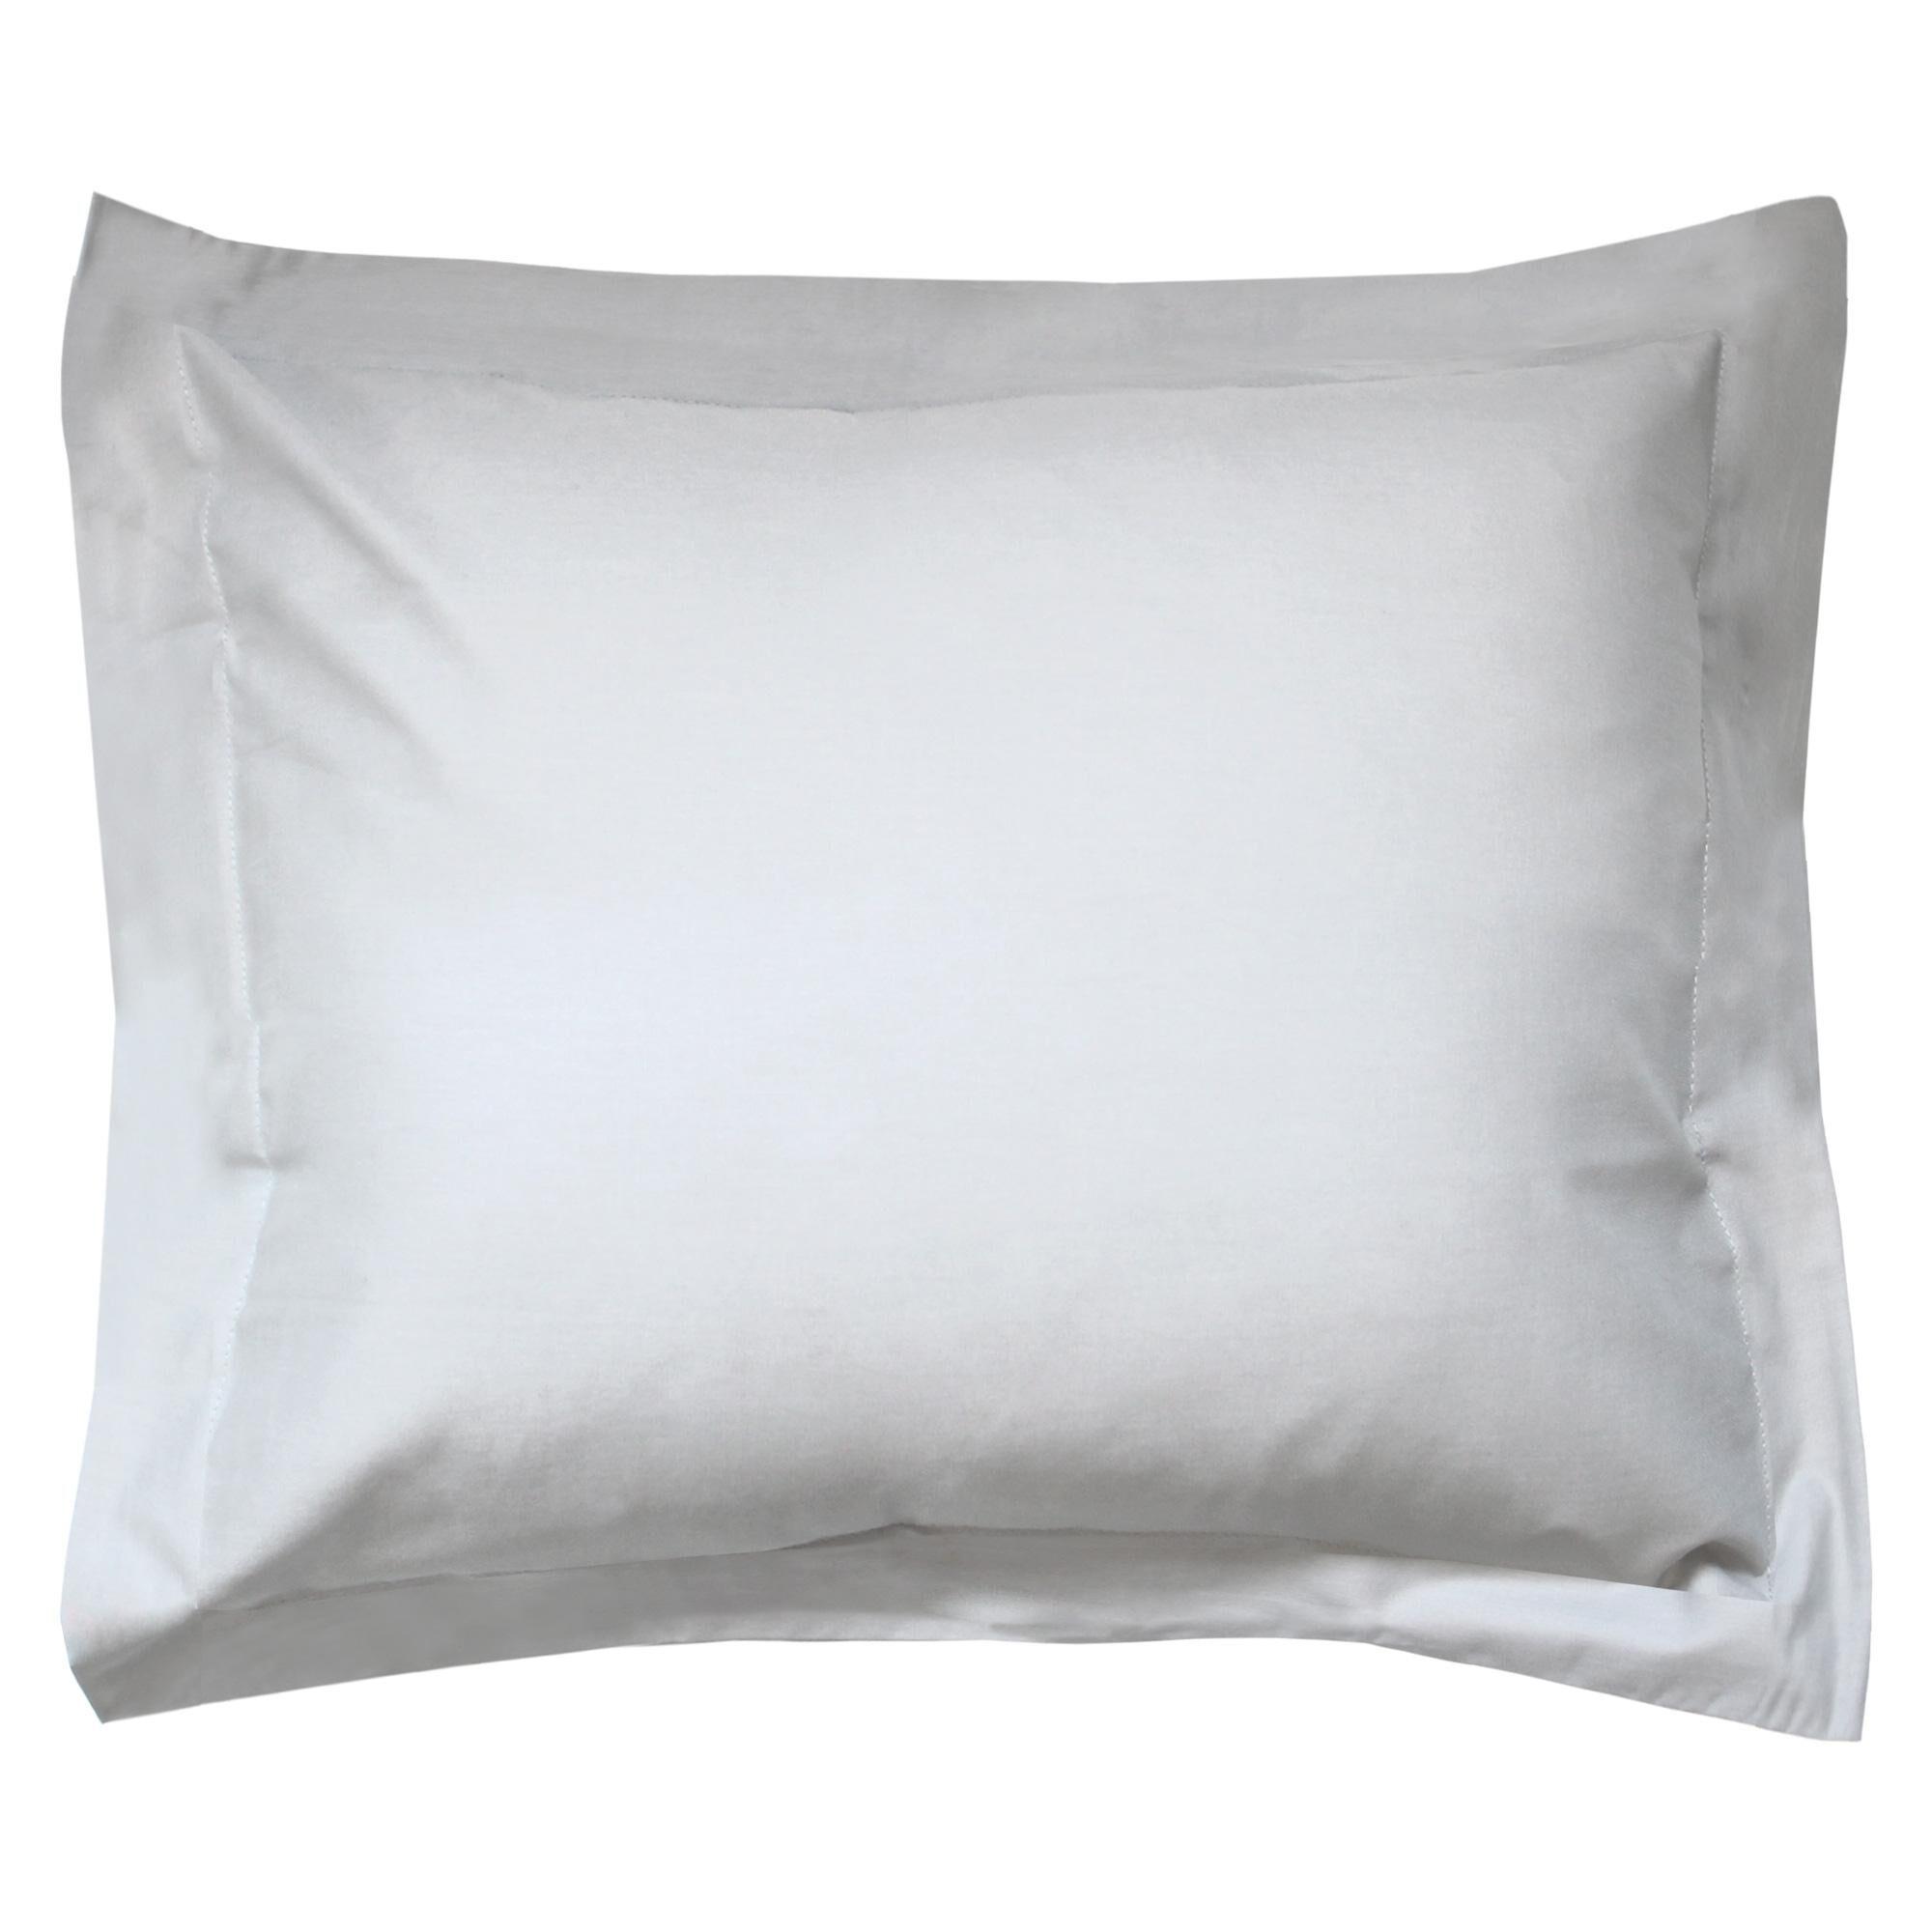 Linnea Taie d'oreiller uni 100x80 cm 100% coton ALTO Calcium